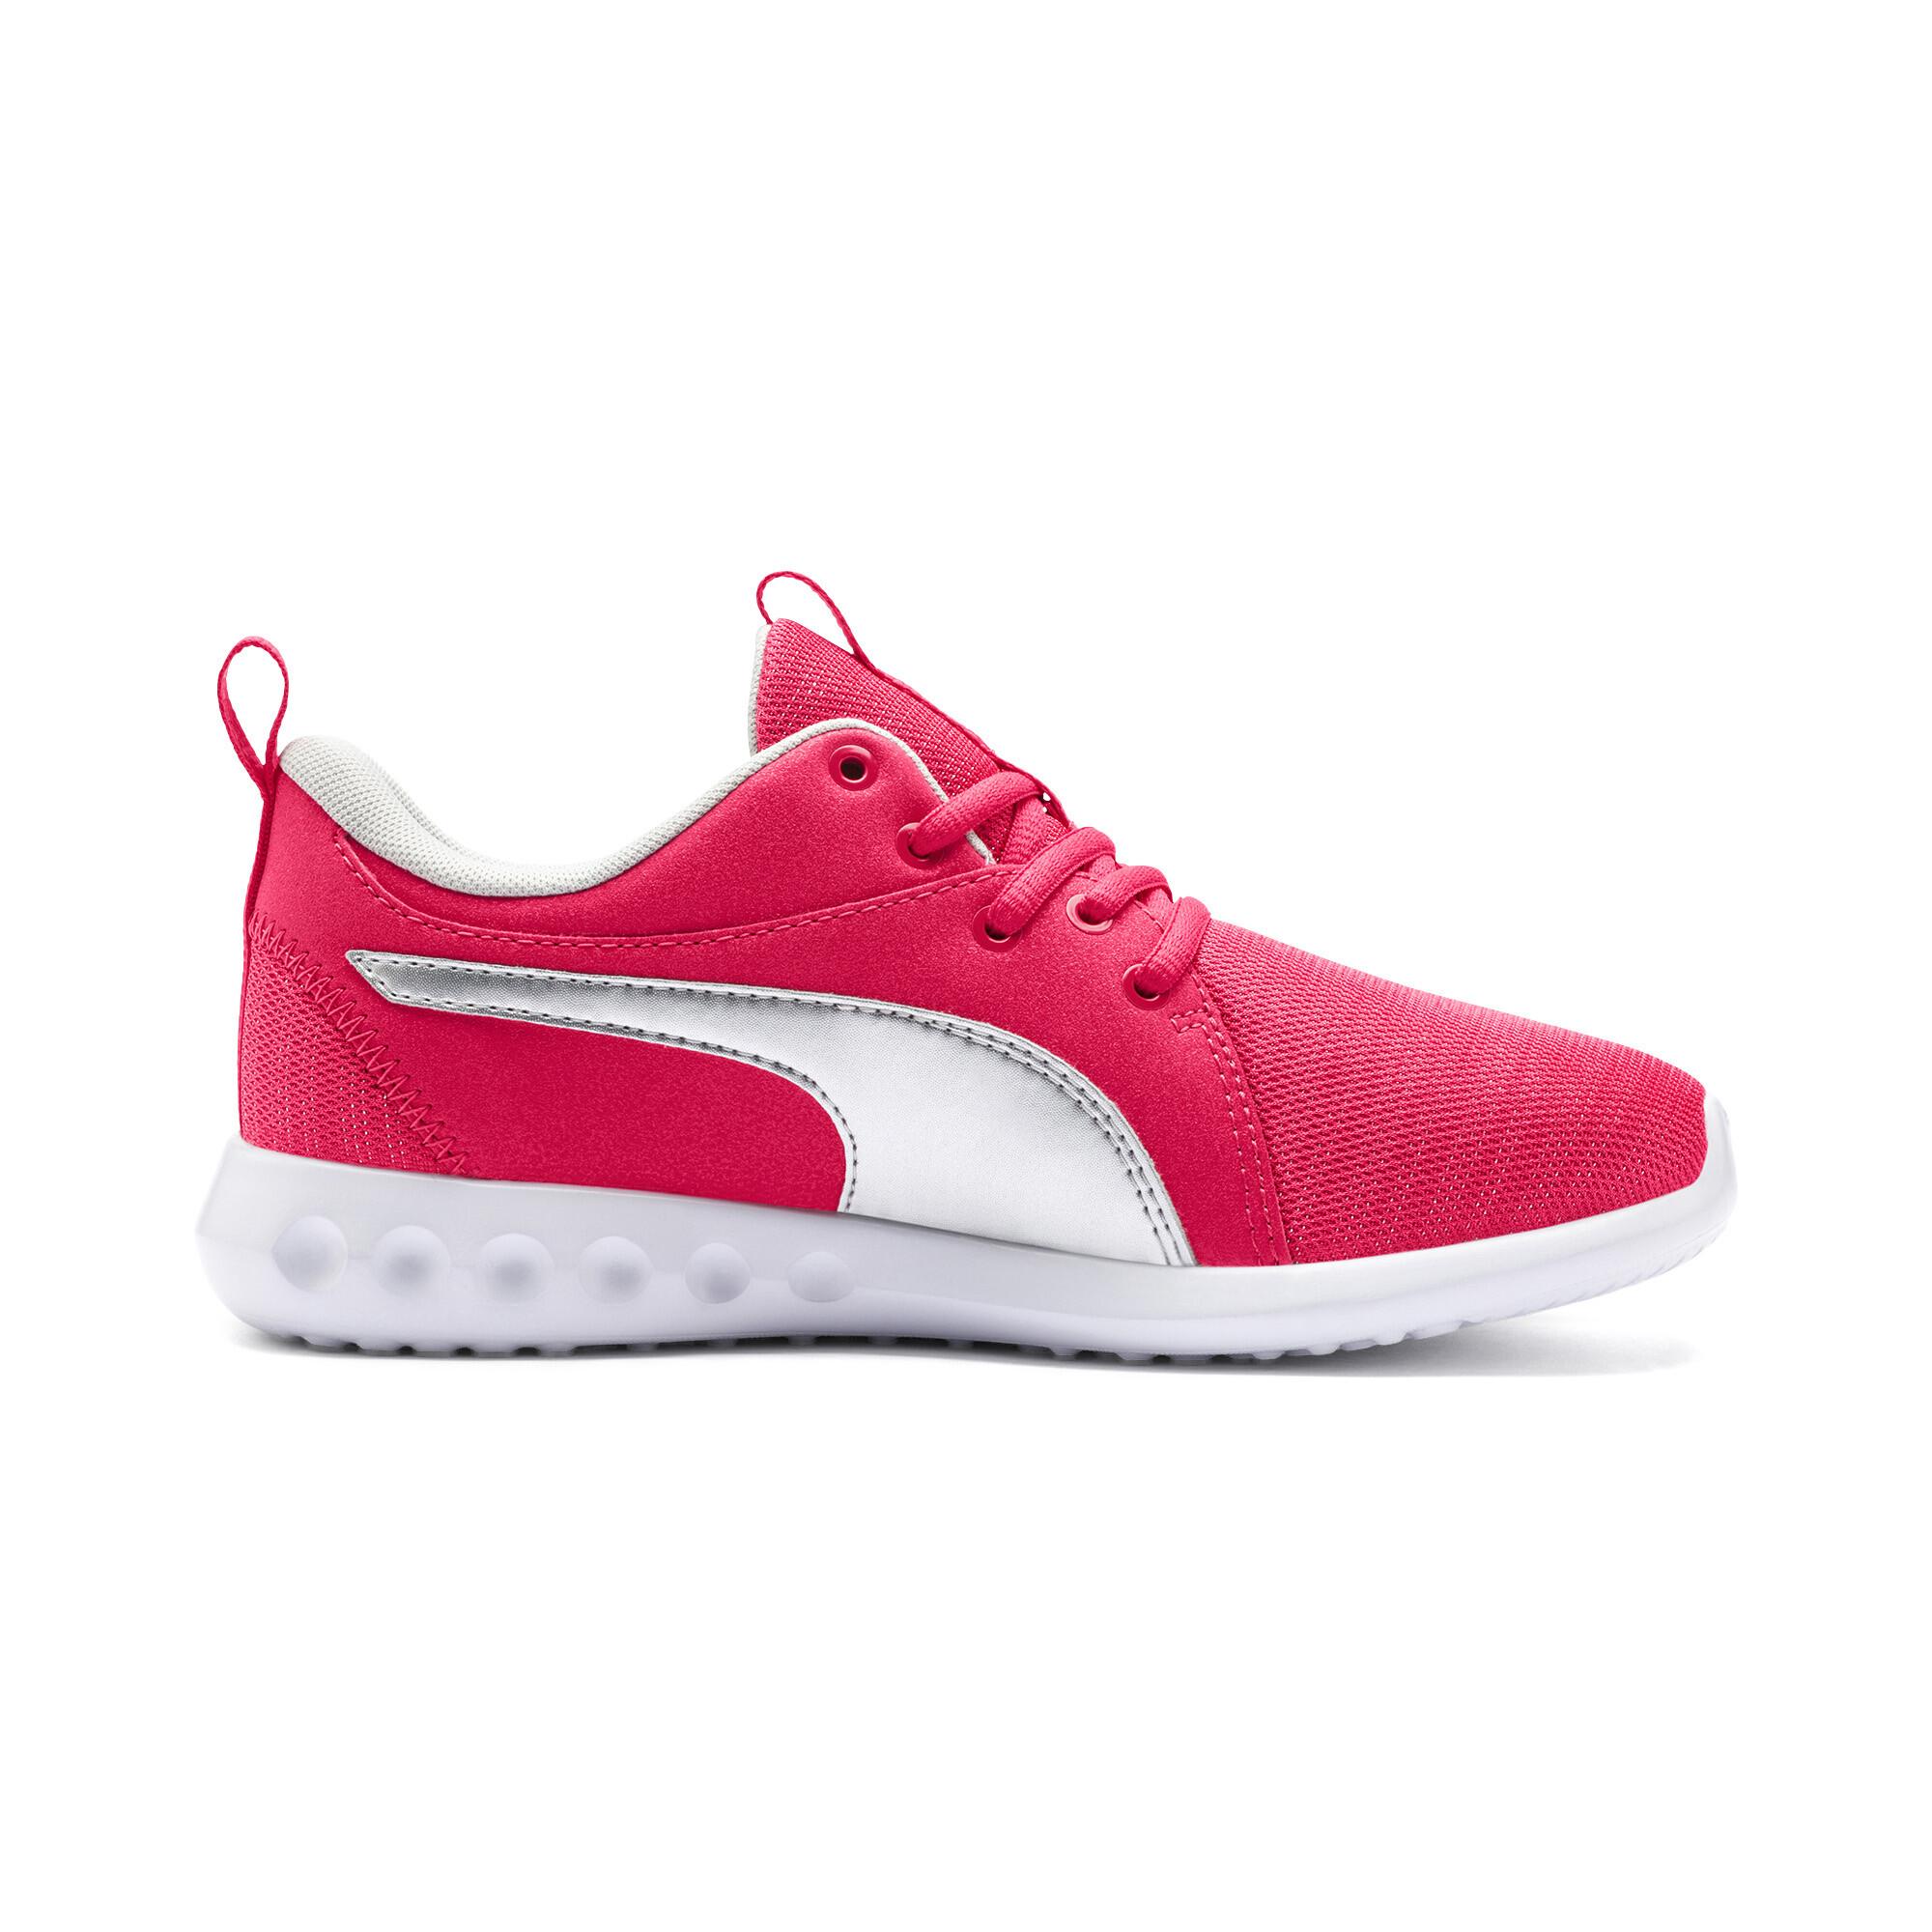 PUMA-Carson-2-Glitz-Shoes-JR-Girls-Shoe-Kids thumbnail 6